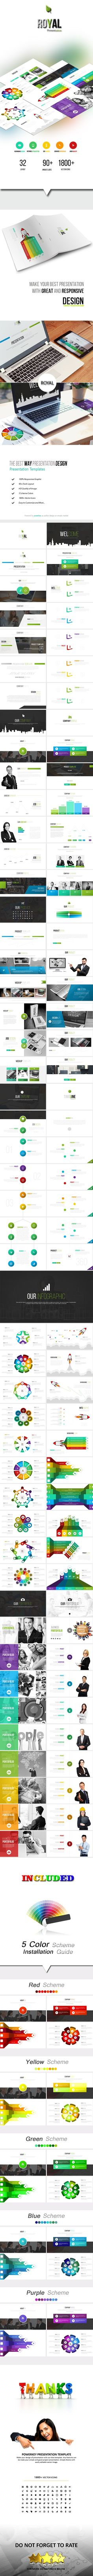 ROYAL - Google Slides Pitch Deck Templates - Google Slides Presentation Templates